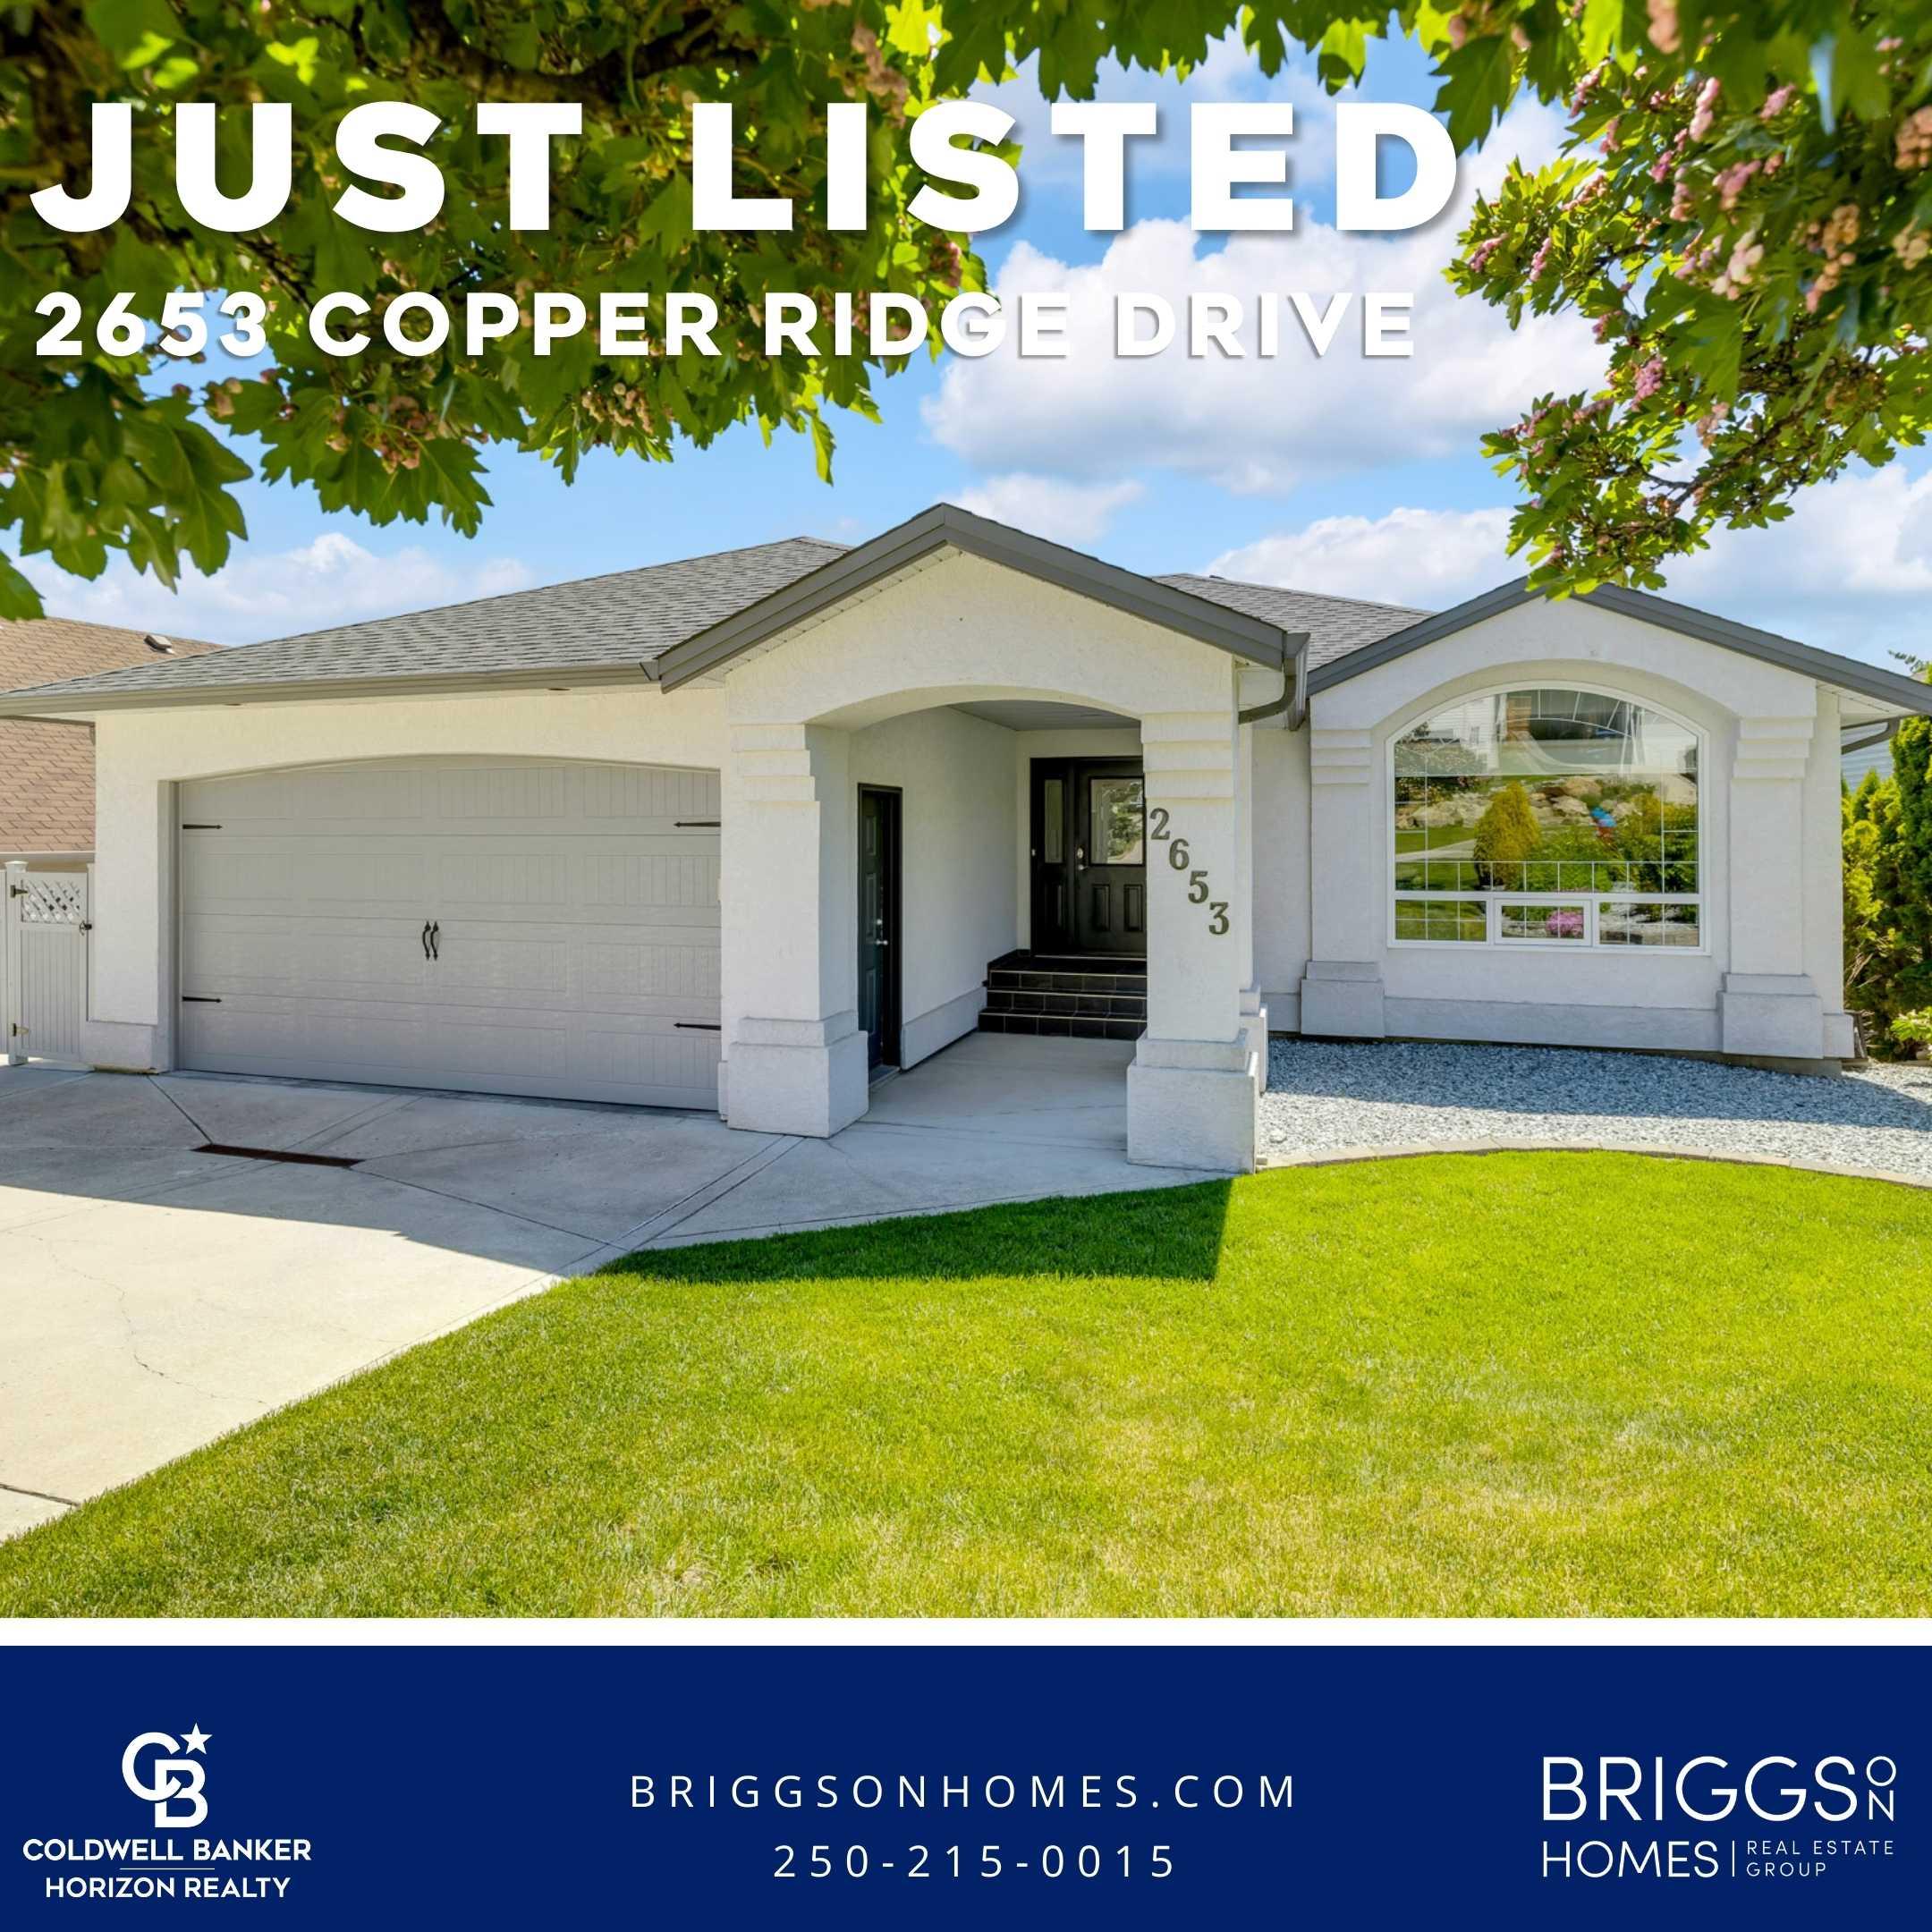 2653 Copper Ridge Dr